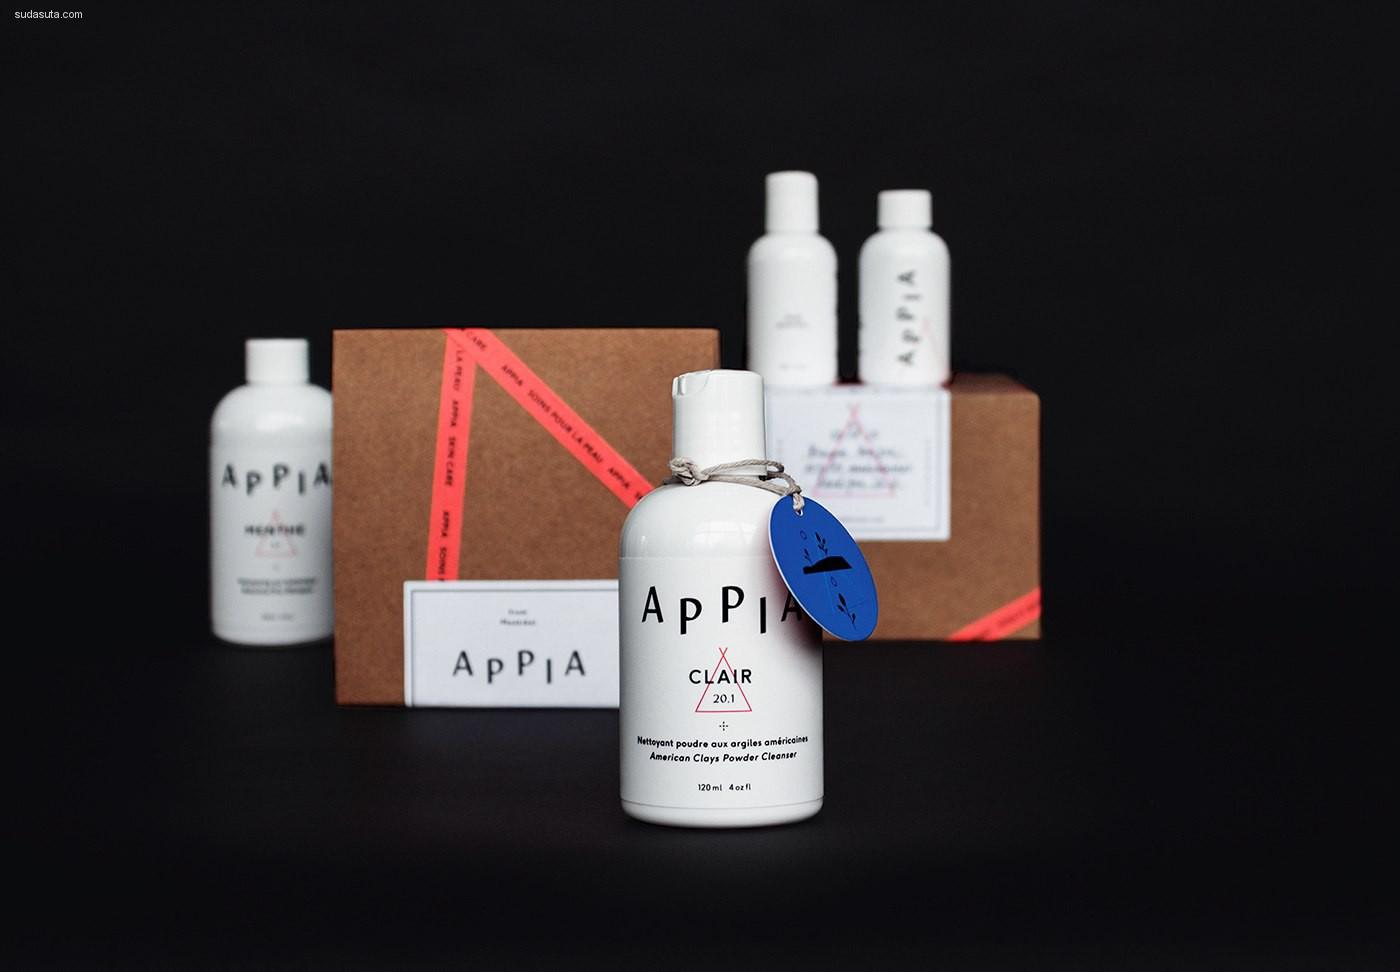 APPIA 品牌设计欣赏